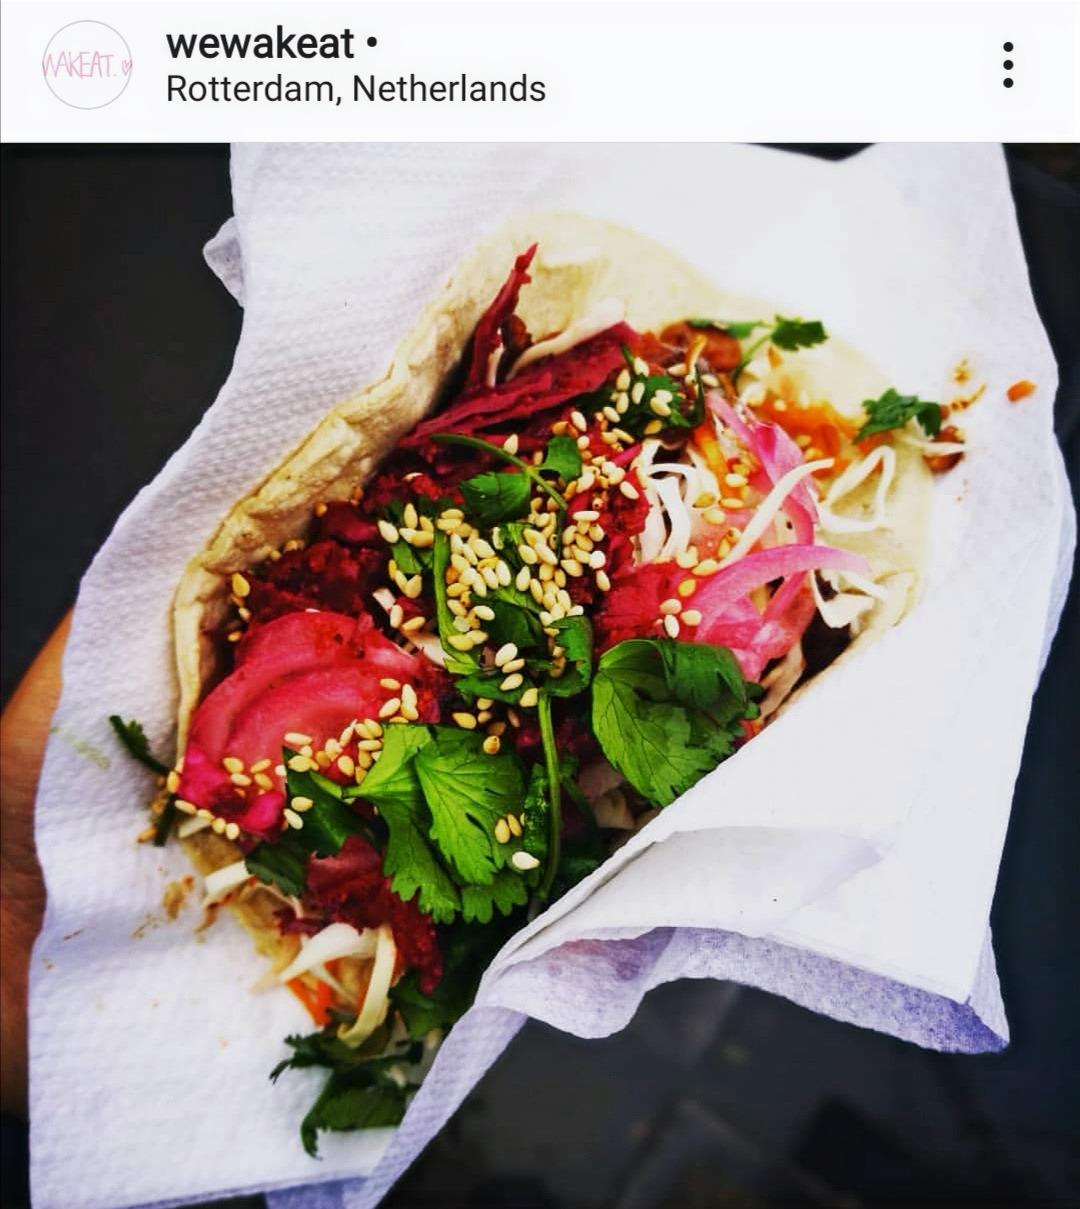 Miso x Korean style vegan tacos